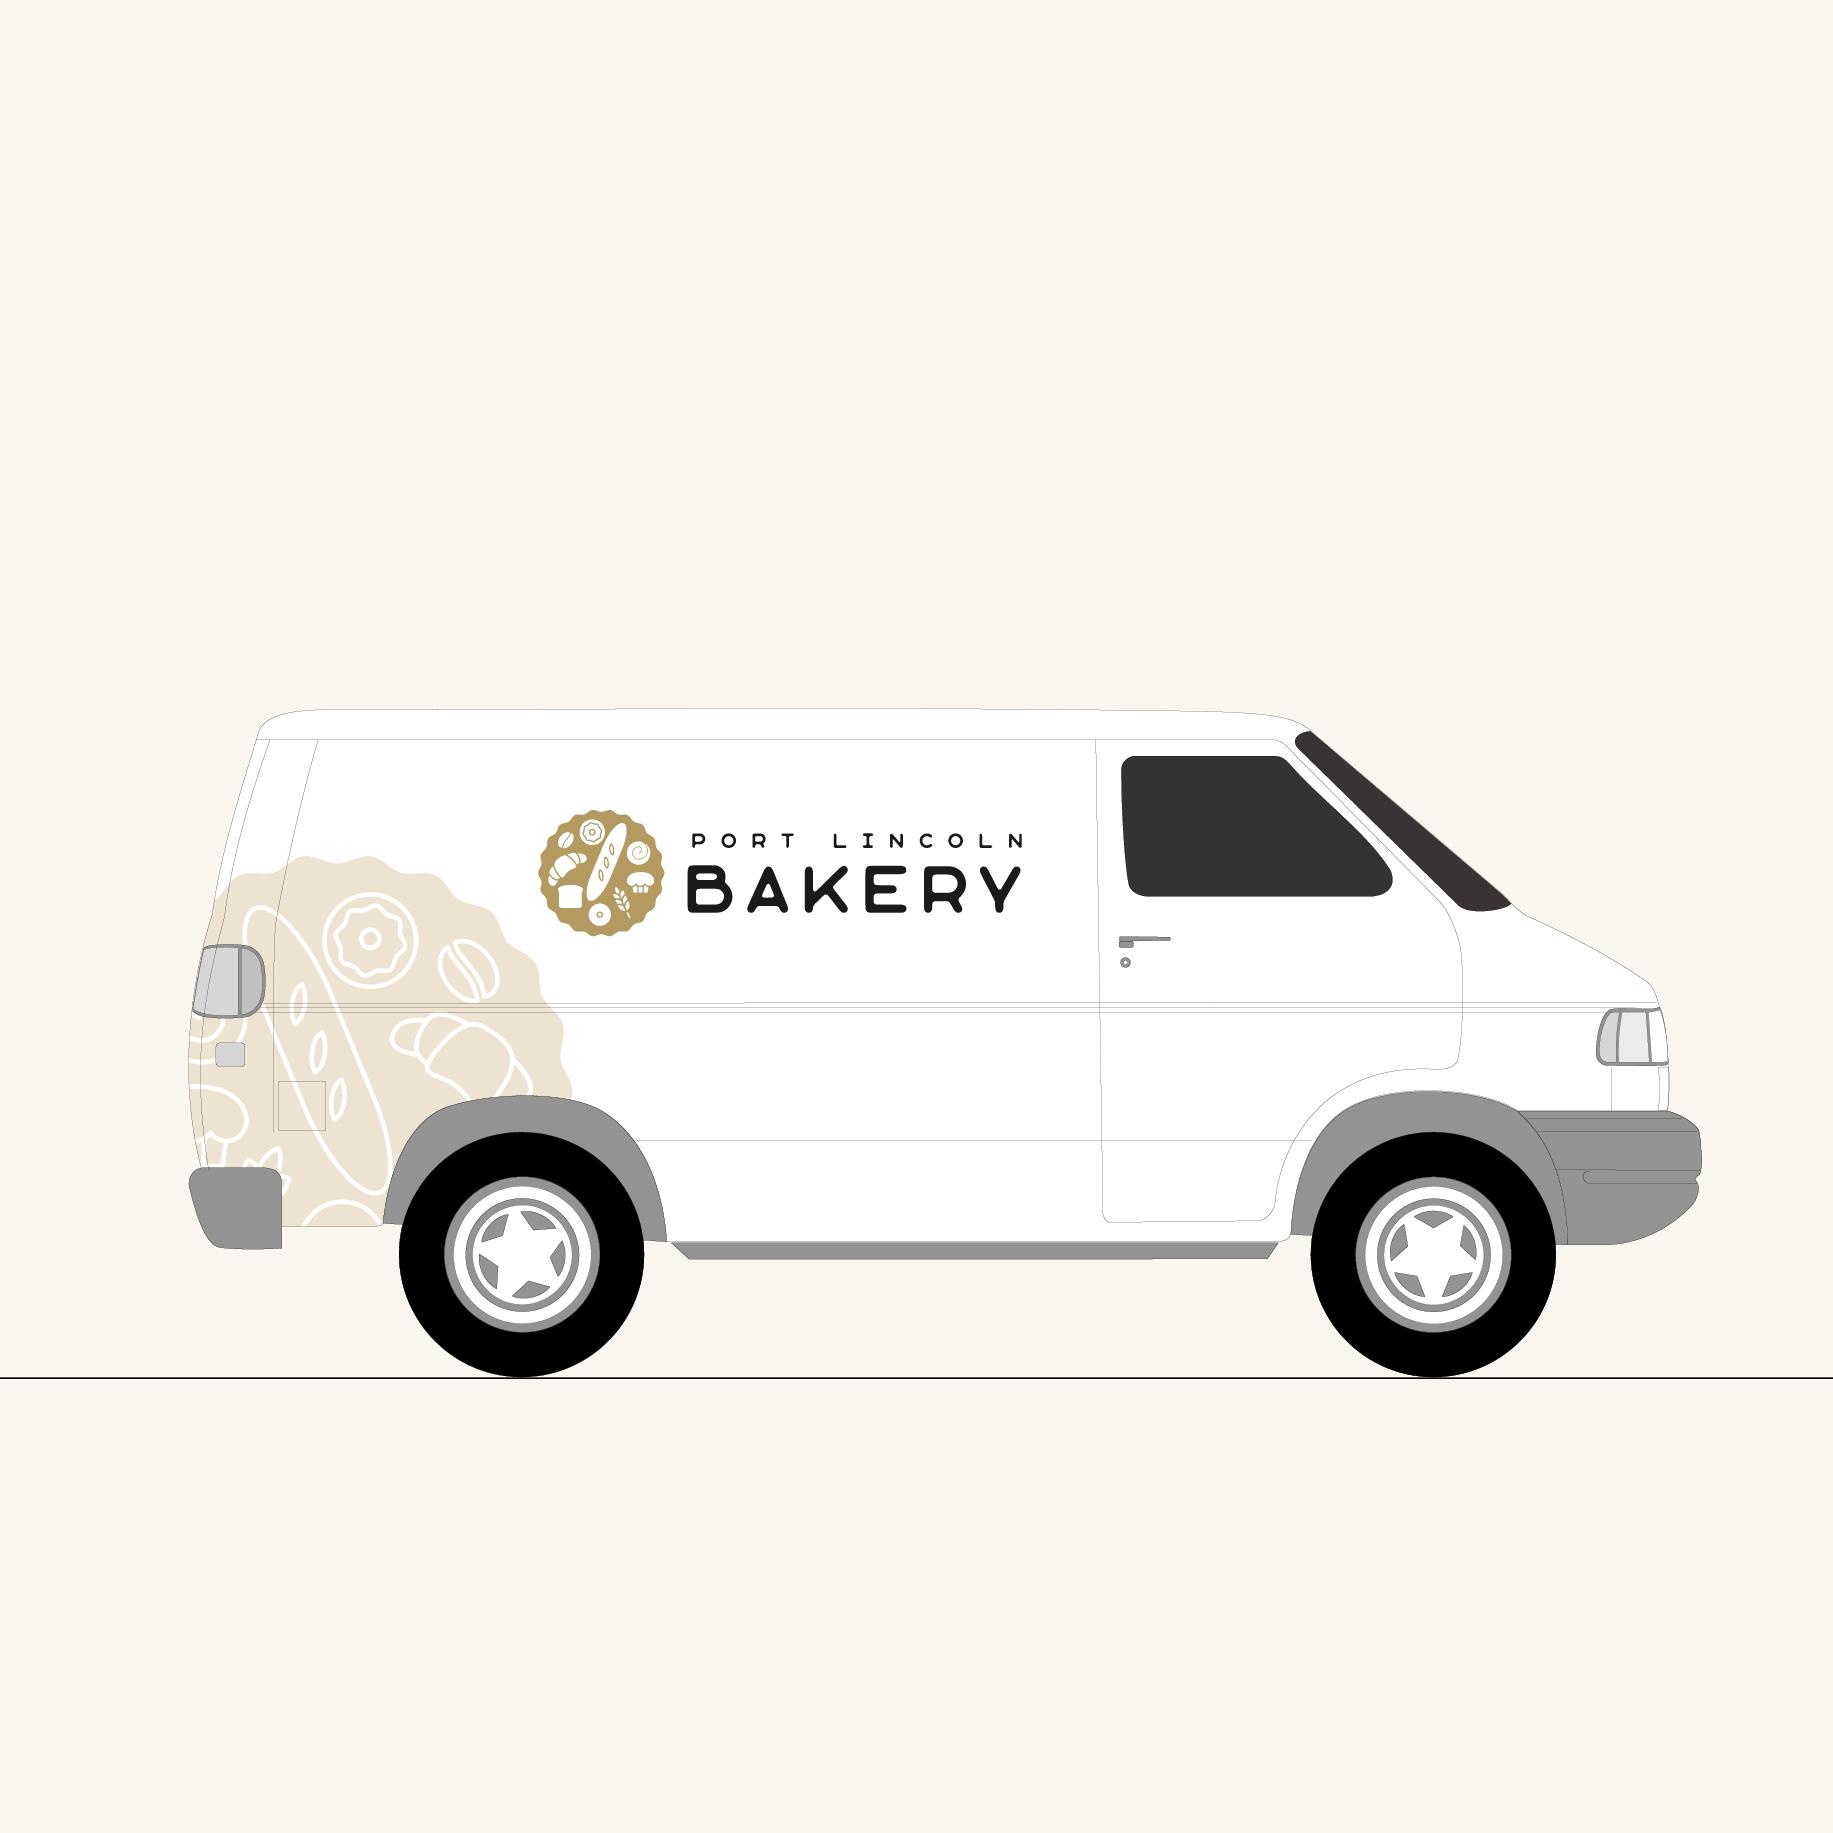 Port Lincoln Bakery Vehicle Design